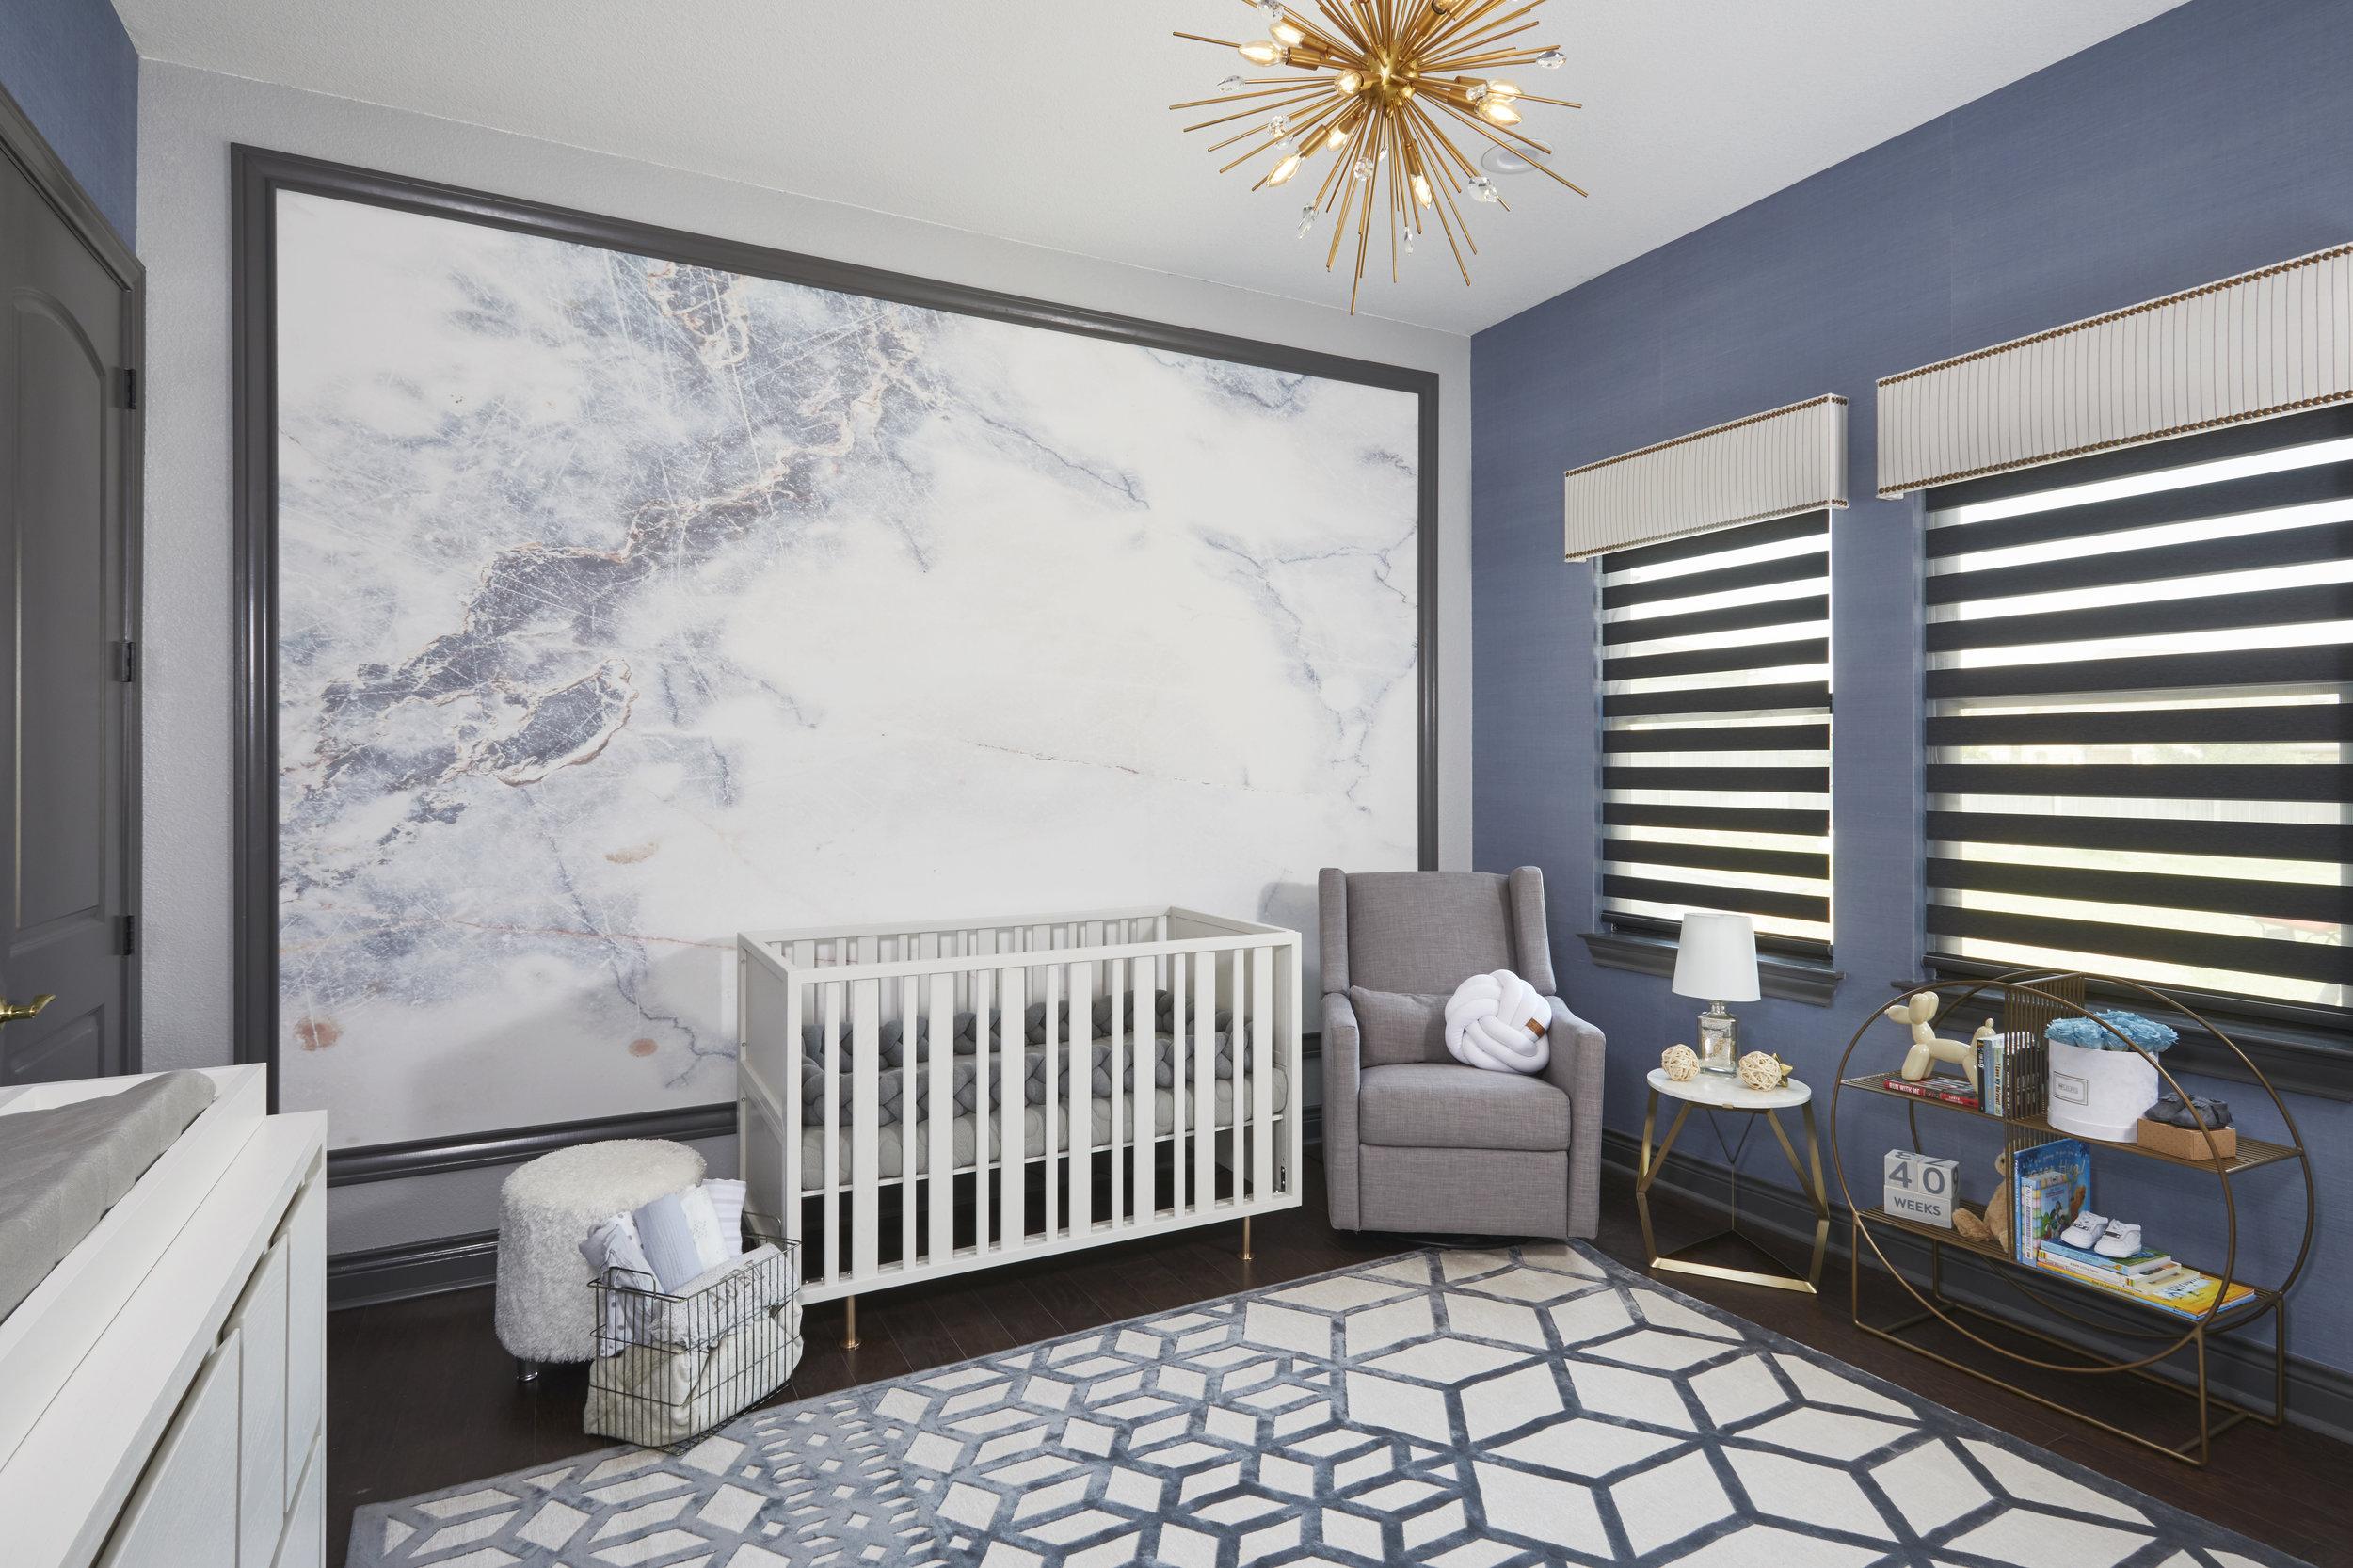 Sanya_Richards_Ross_Nursery